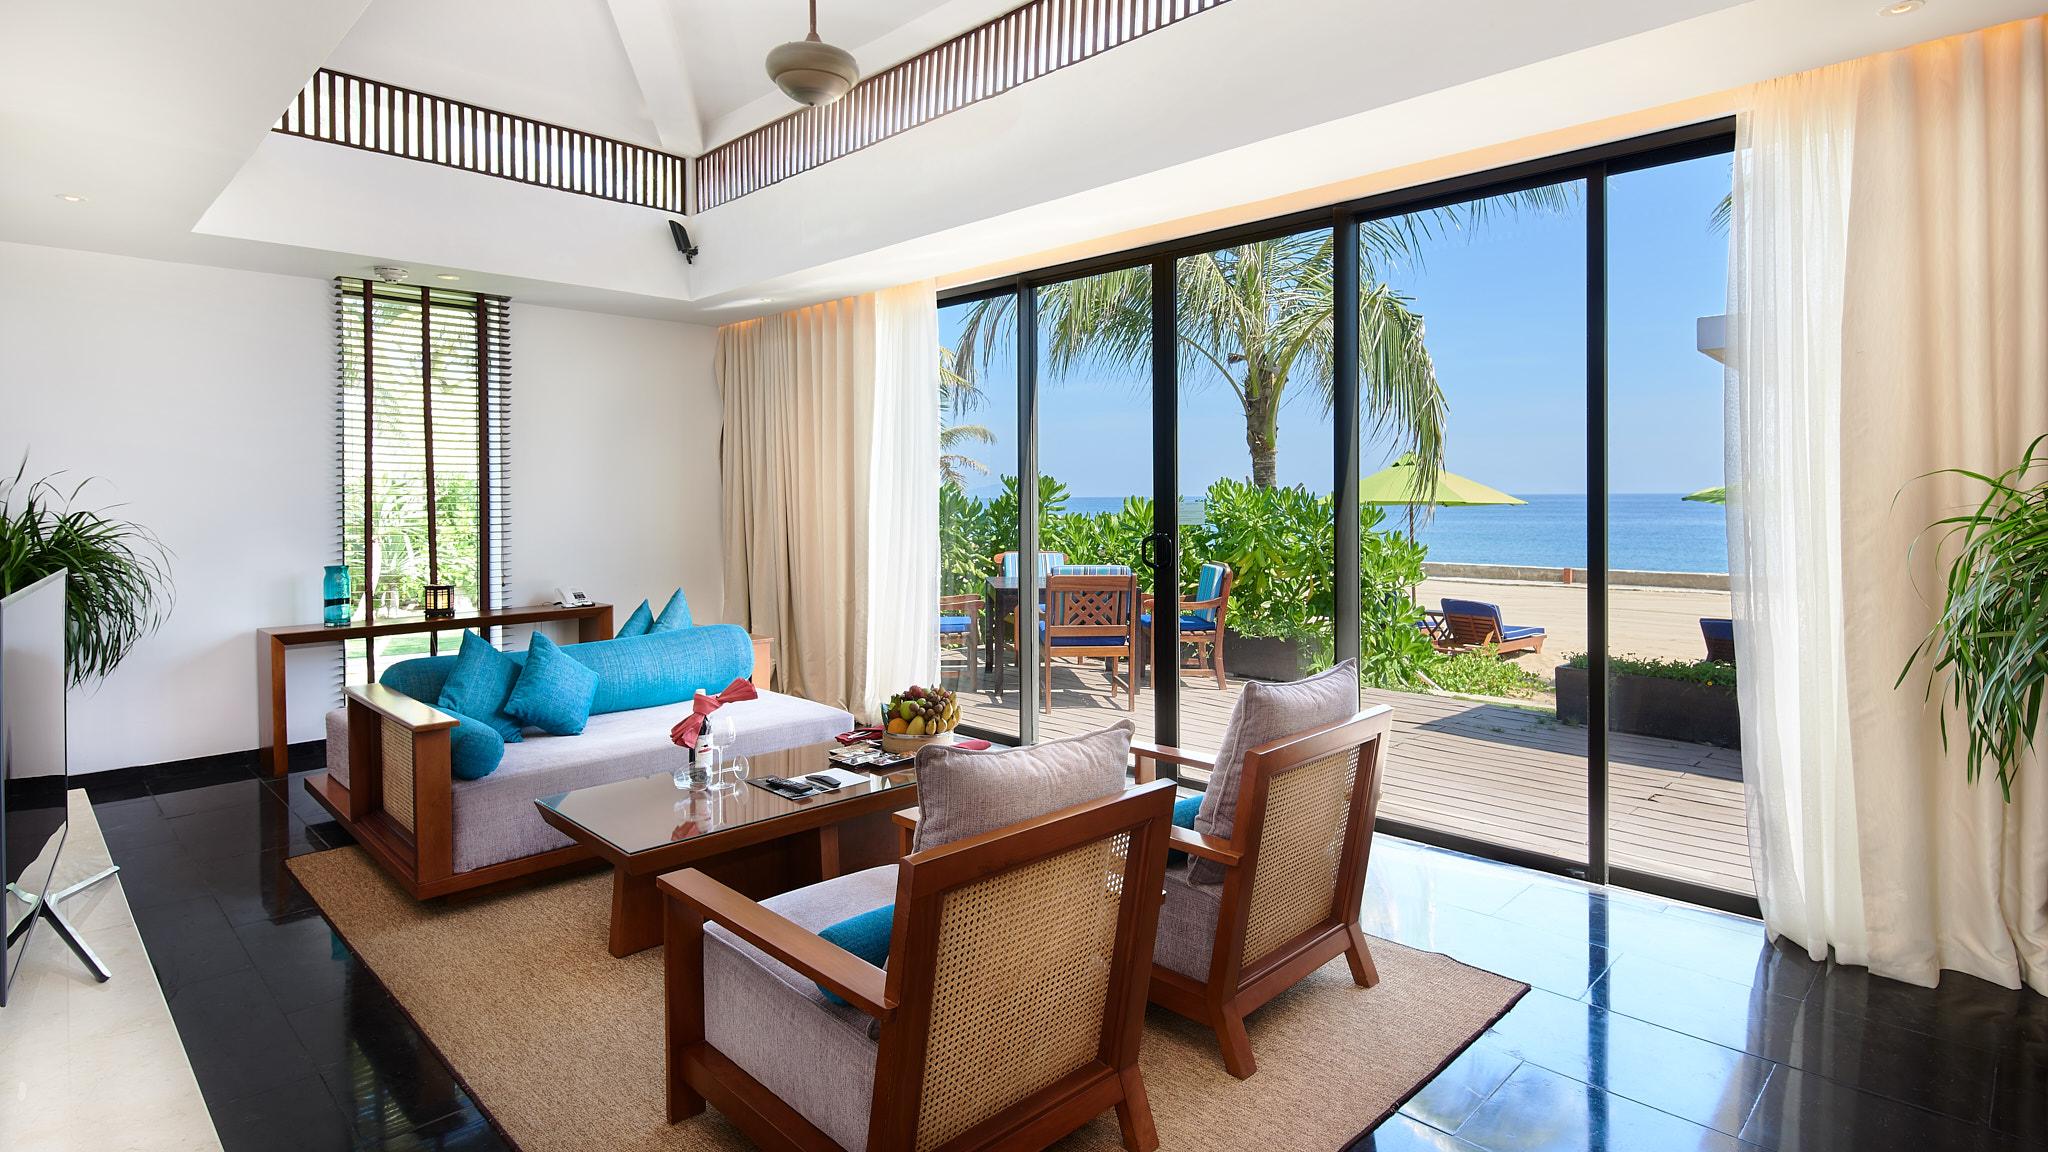 0125_Sunrise Hoi An_Villa 2 Bedroom Living Room.jpg